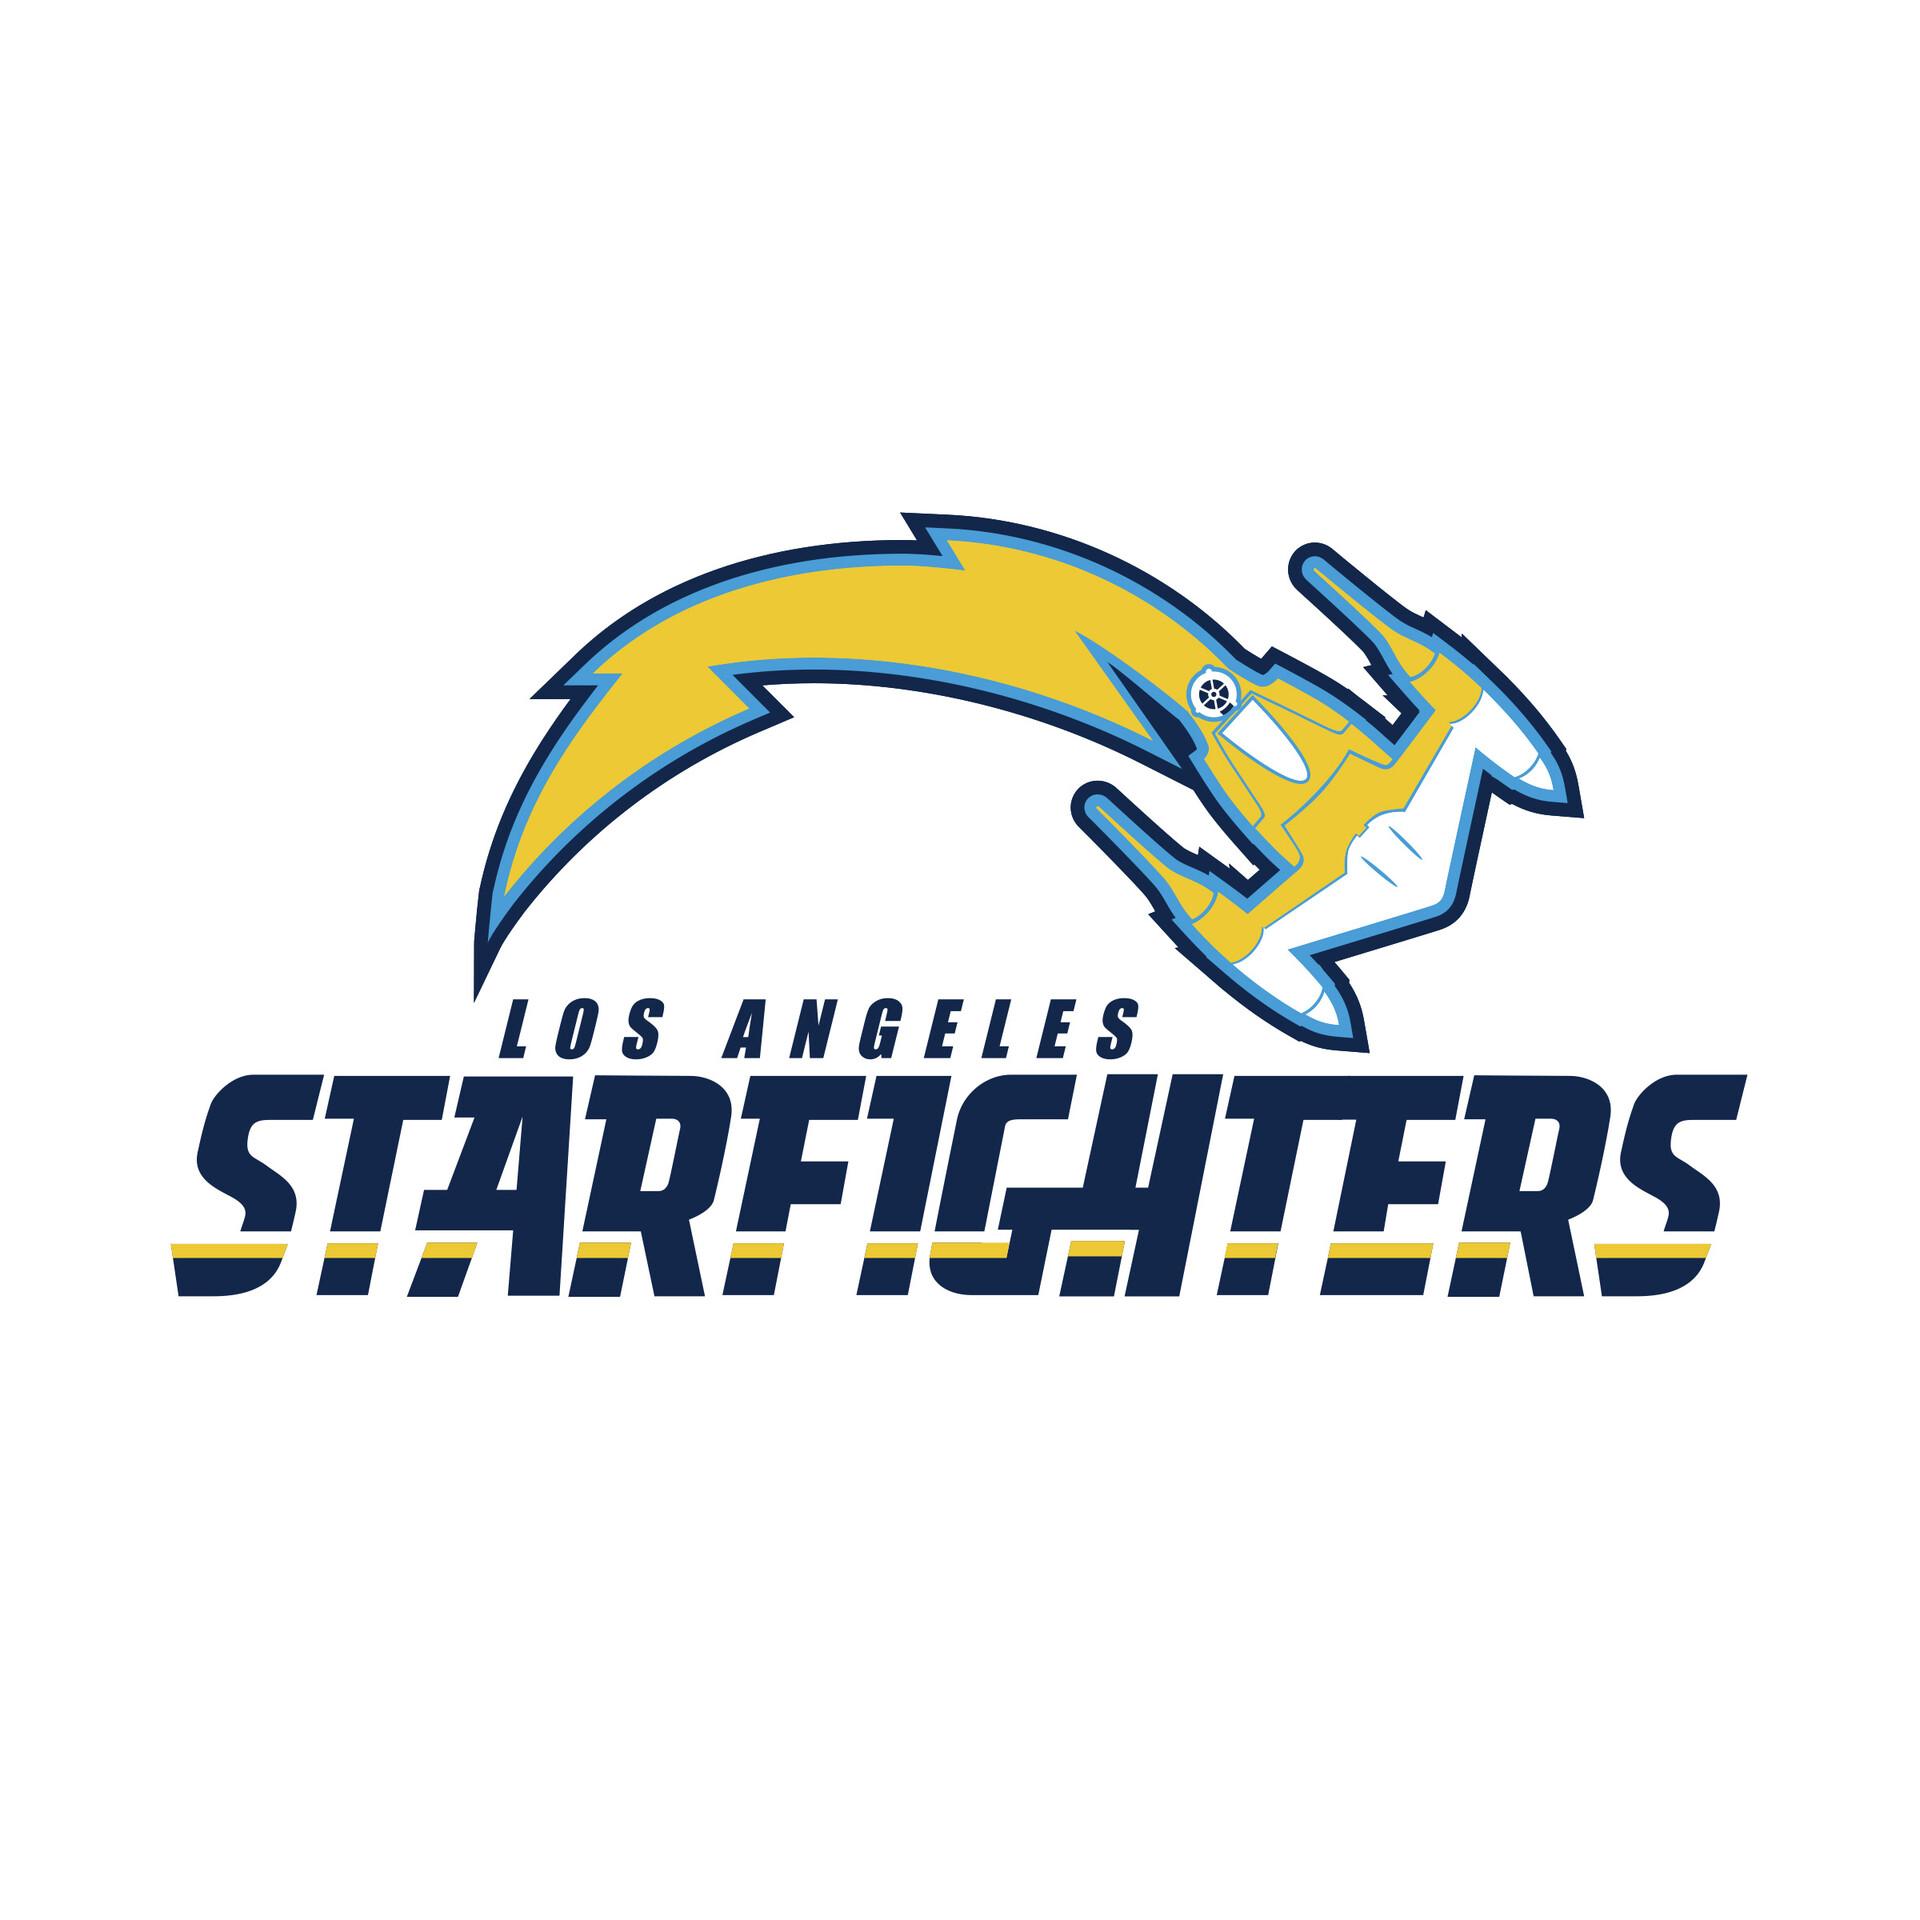 Los Angeles Starfighters